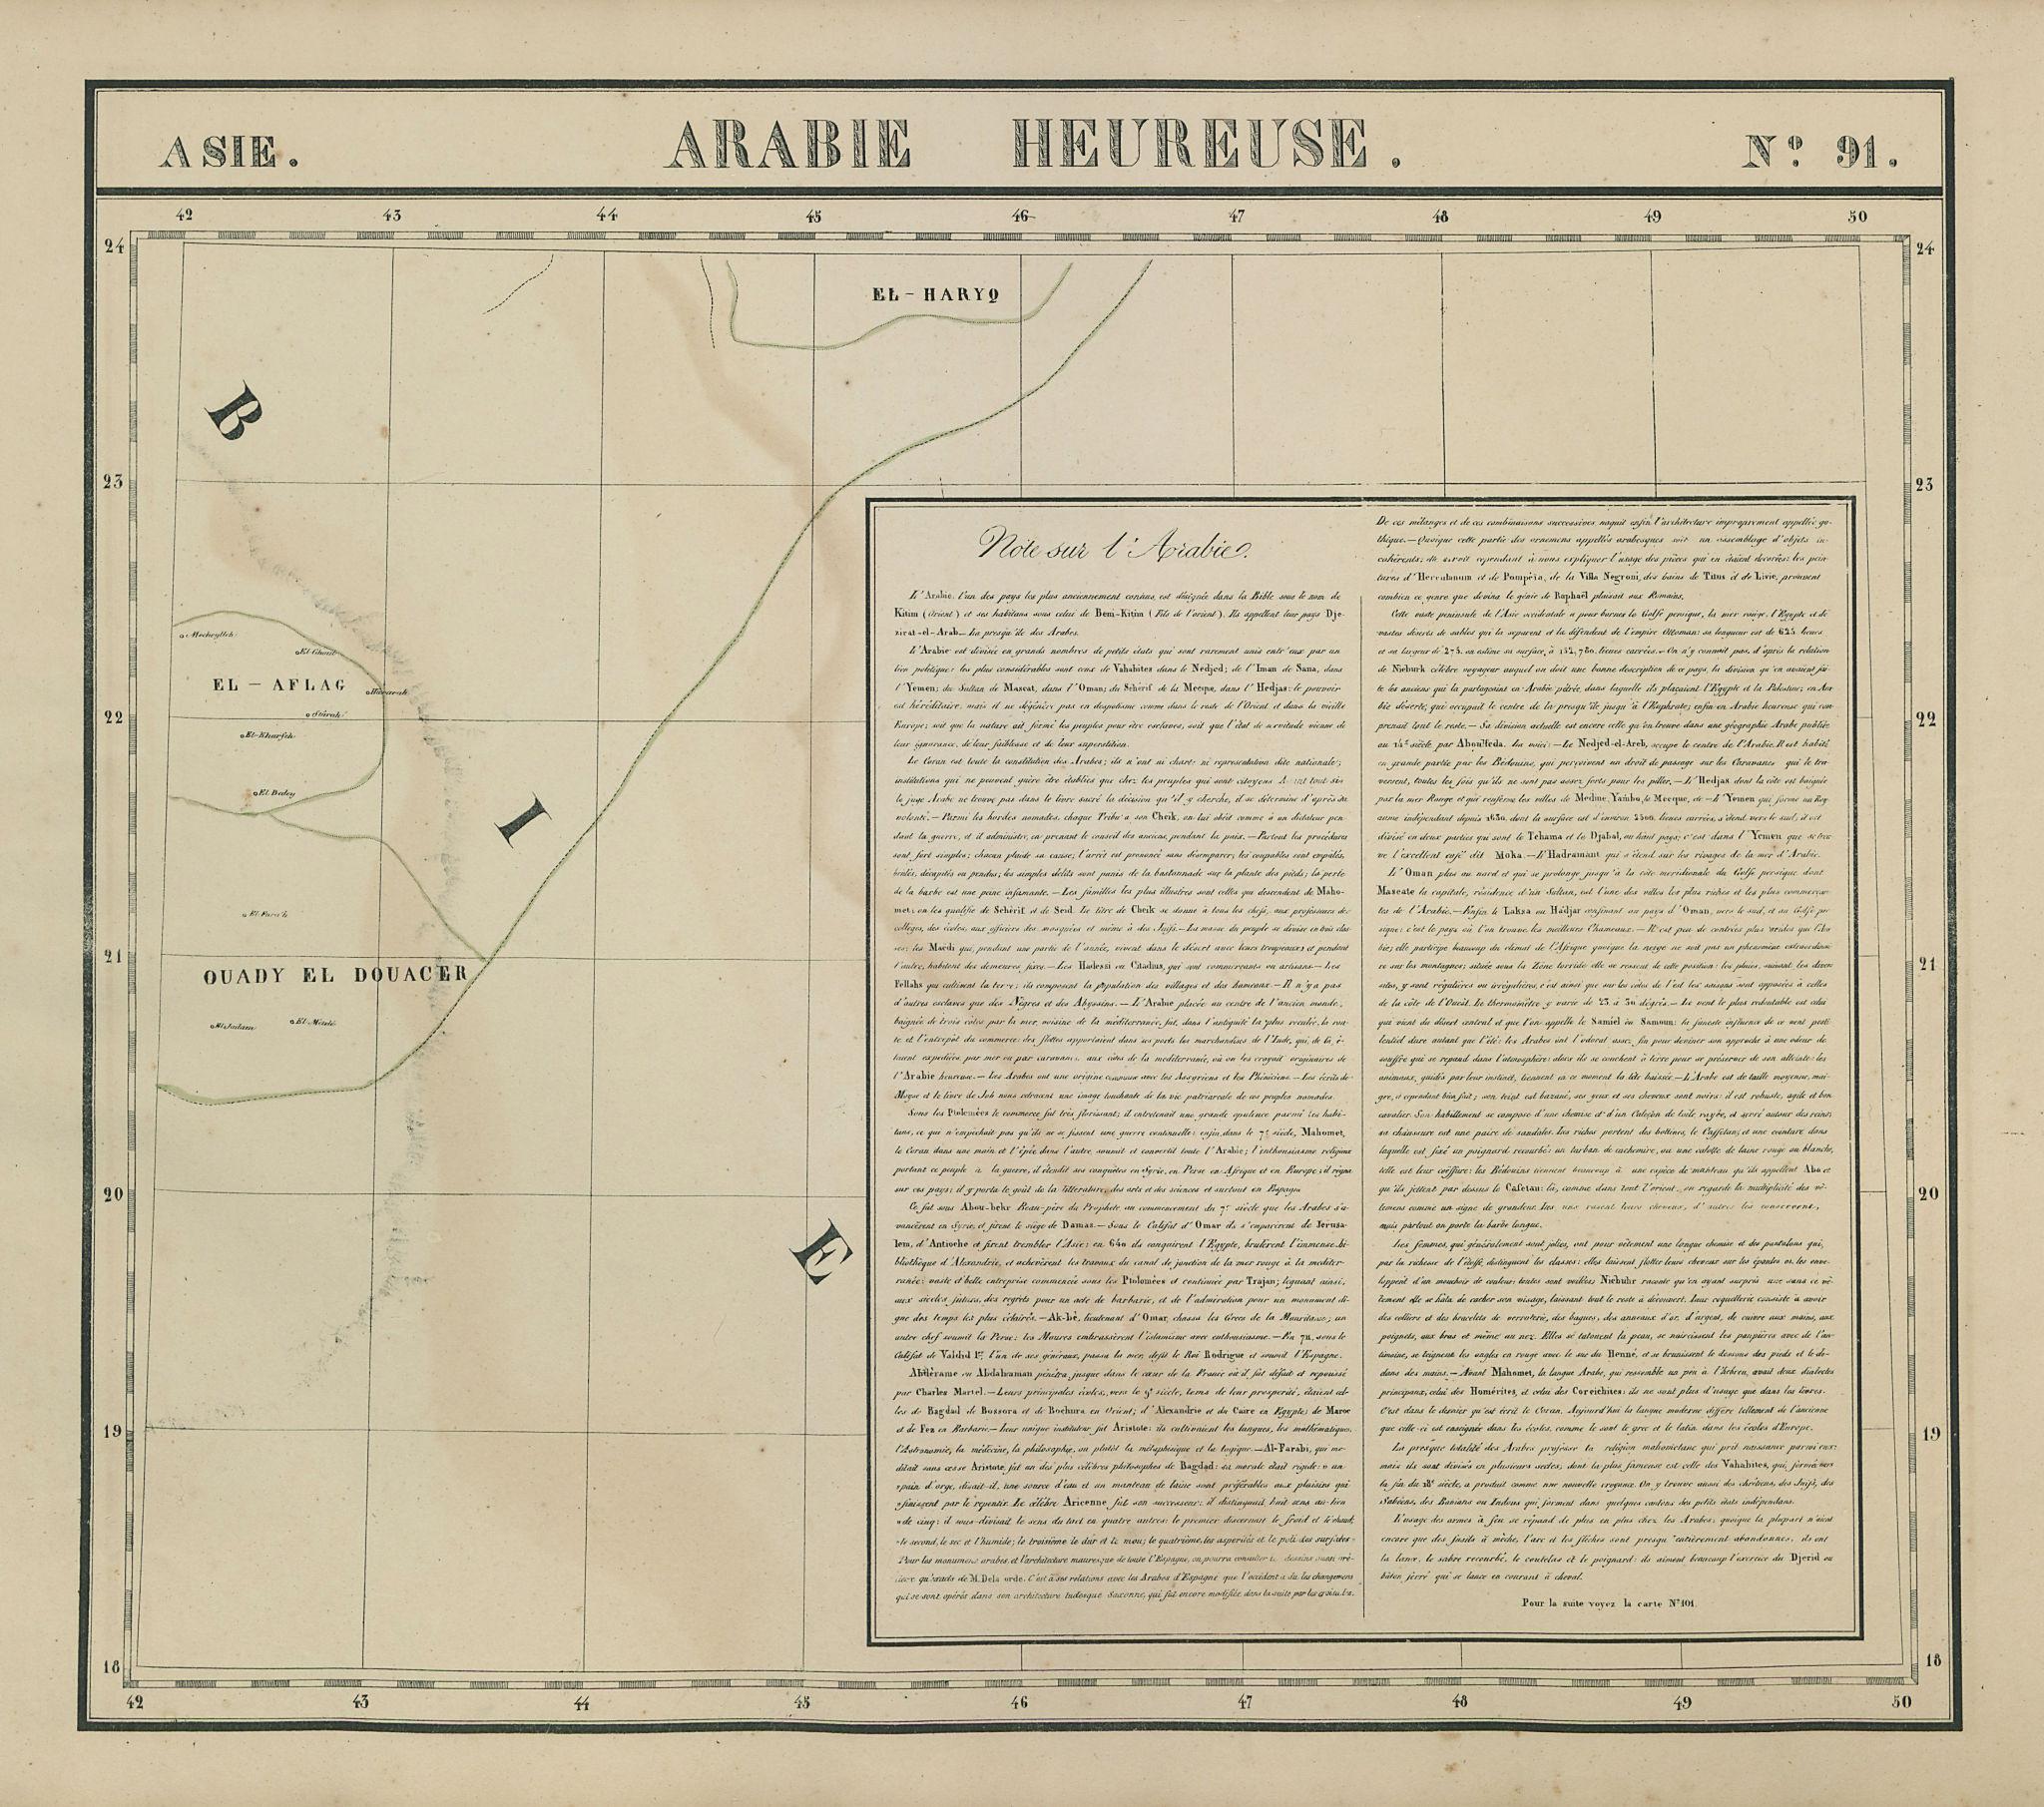 Asie. Arabie Heureuse #91 Saudi Arabia Empty Quarter. VANDERMAELEN 1827 map